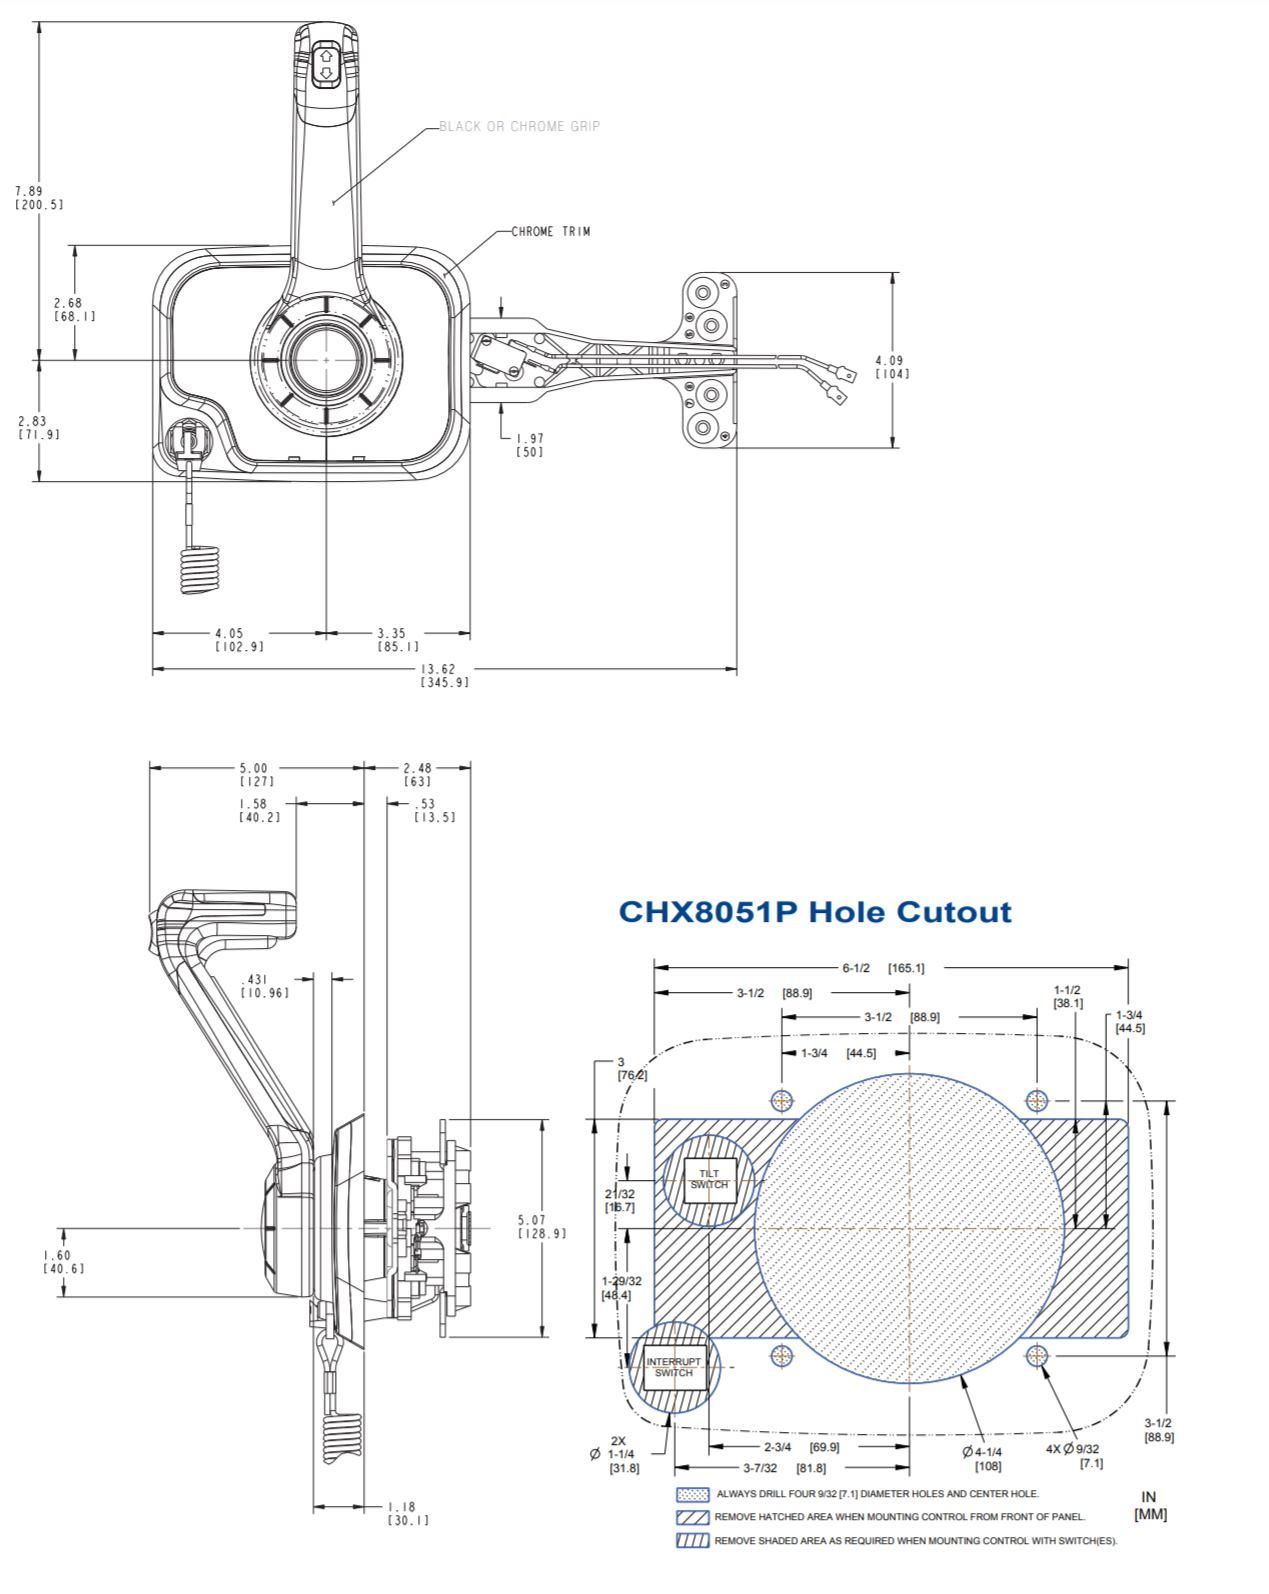 seastar-chx8553p-xtreme-side-mount-control-dimensions.jpg